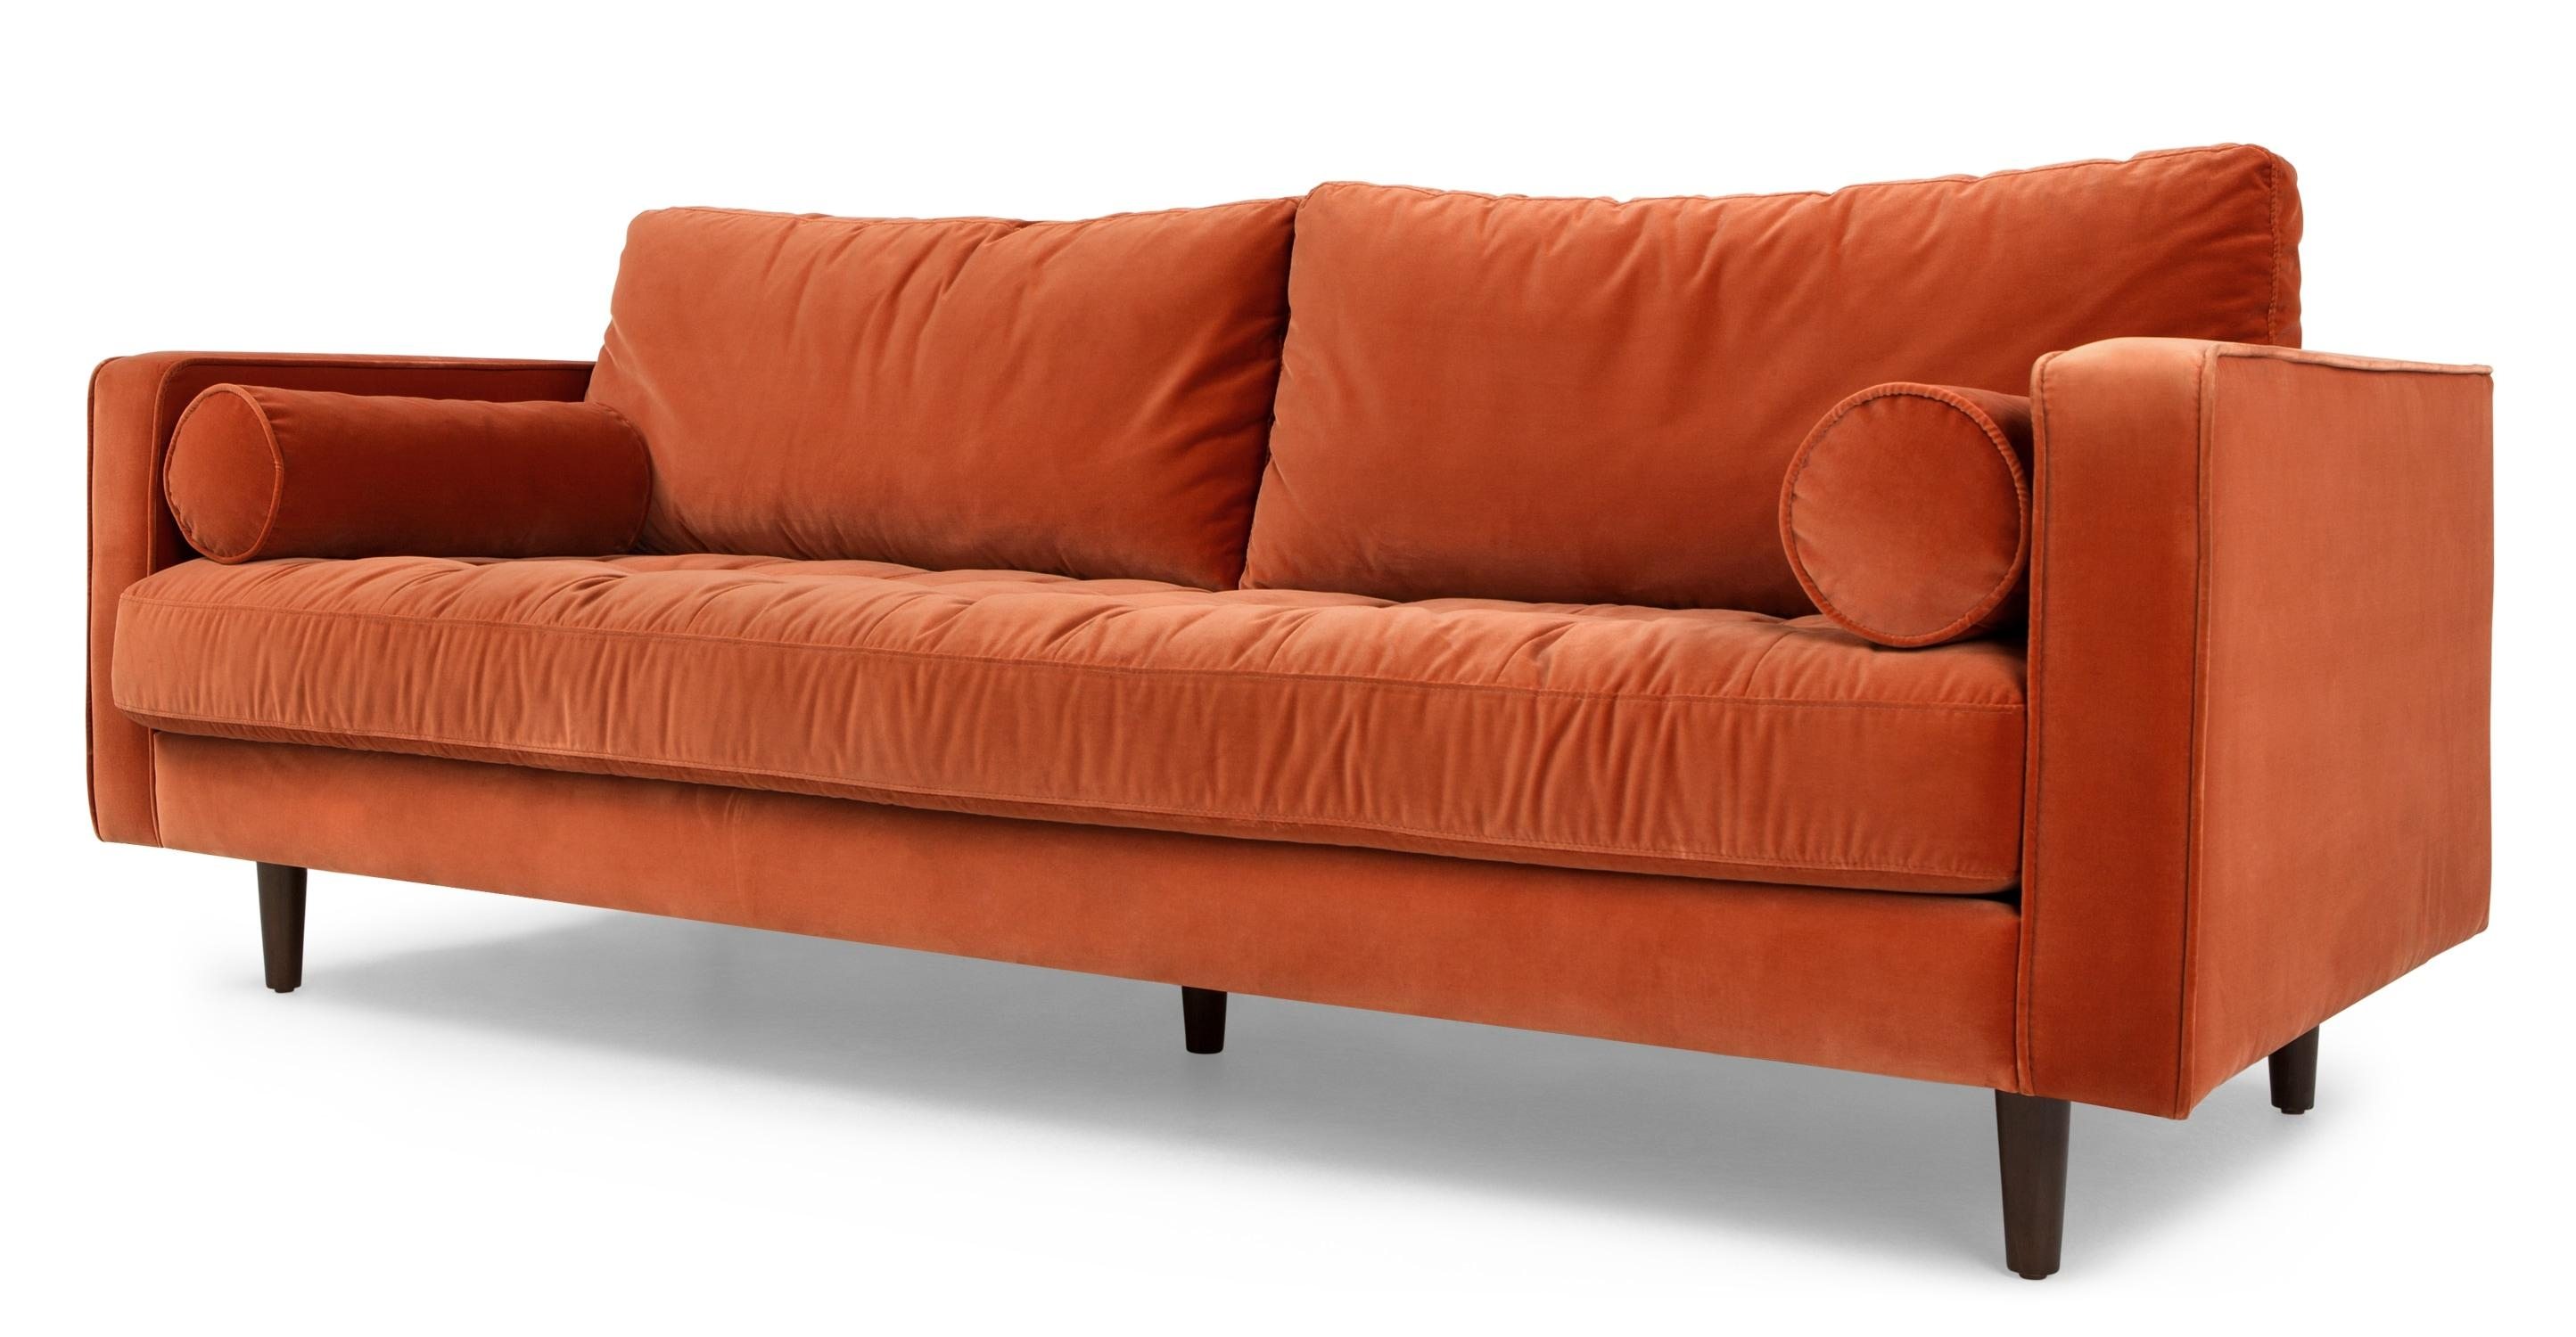 Scott 3 Seater Sofa, Concrete Cotton Velvet | Made In Burnt Orange Sofas (Image 13 of 20)